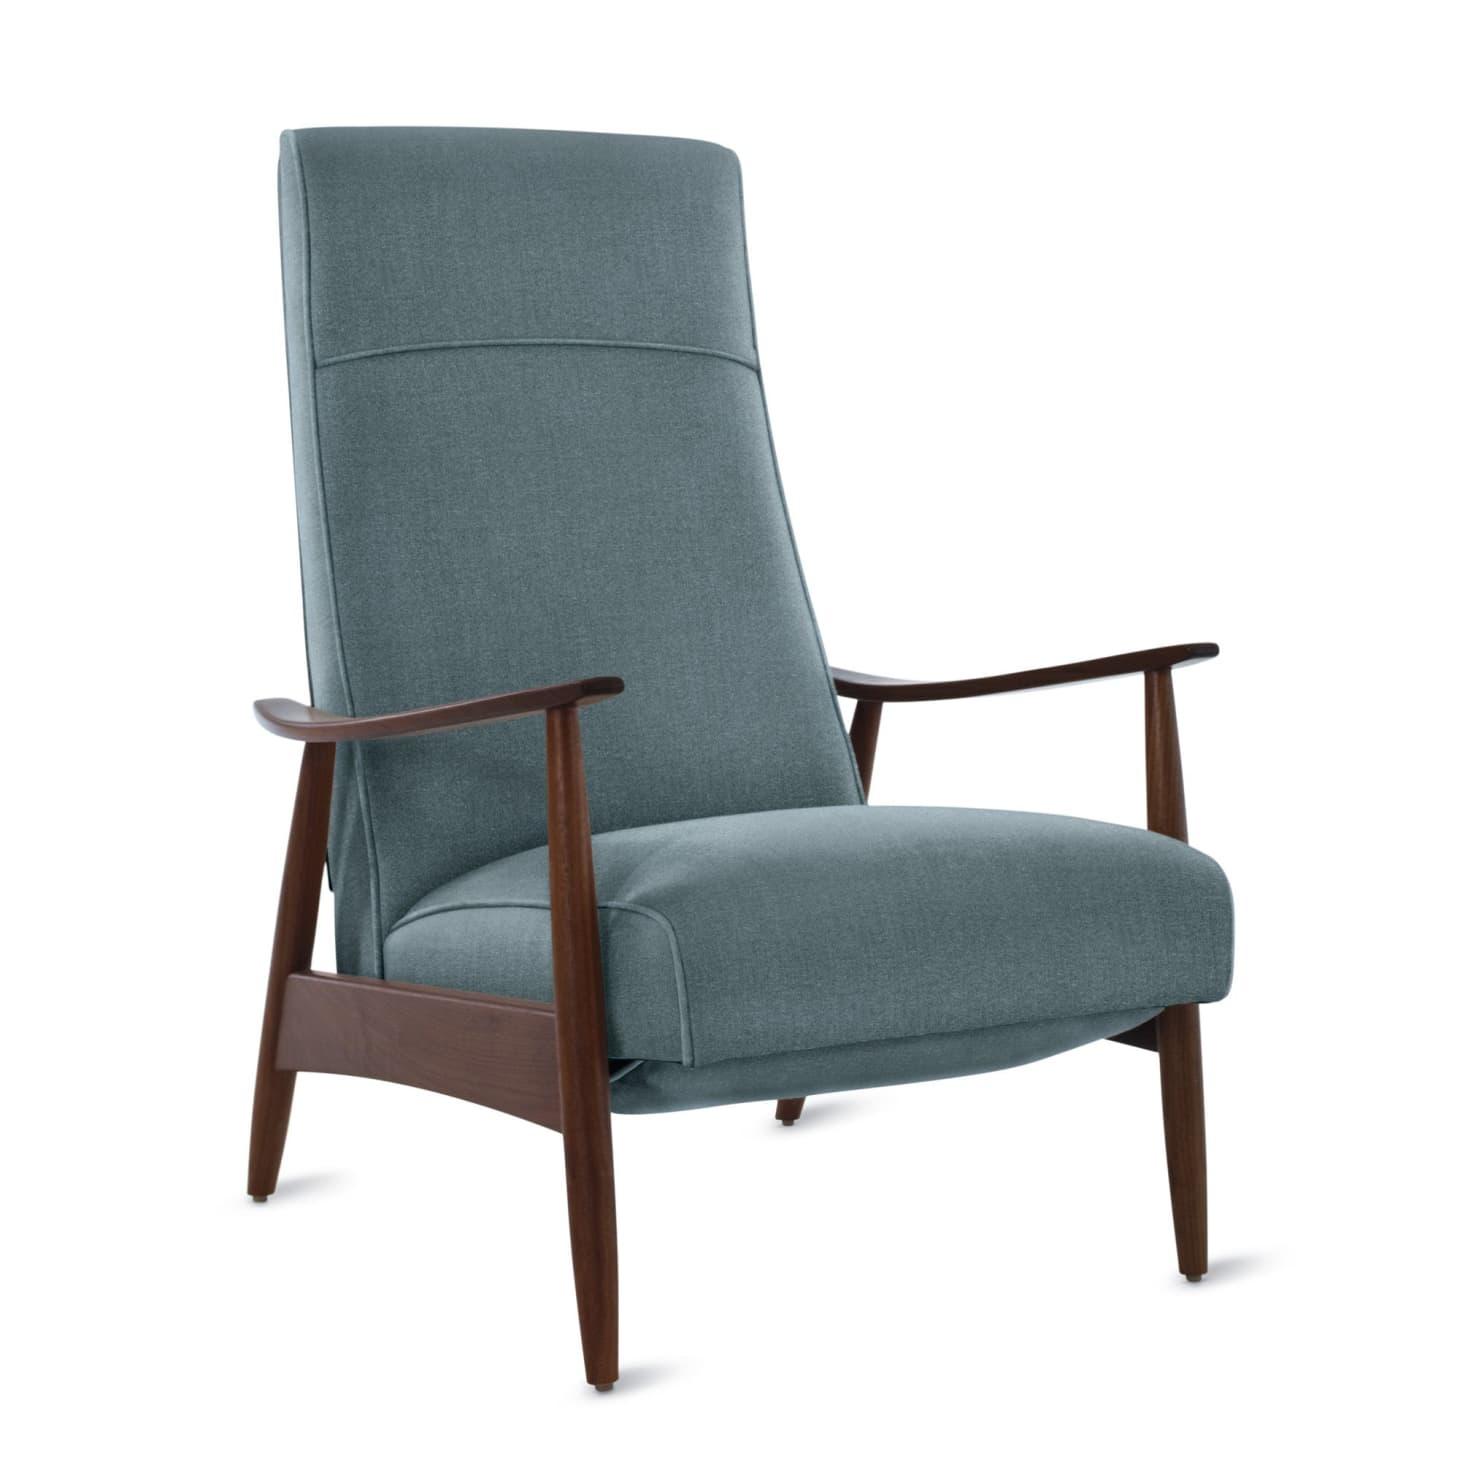 Sensational Attractive Modern Recliner Chairs Apartment Therapy Inzonedesignstudio Interior Chair Design Inzonedesignstudiocom